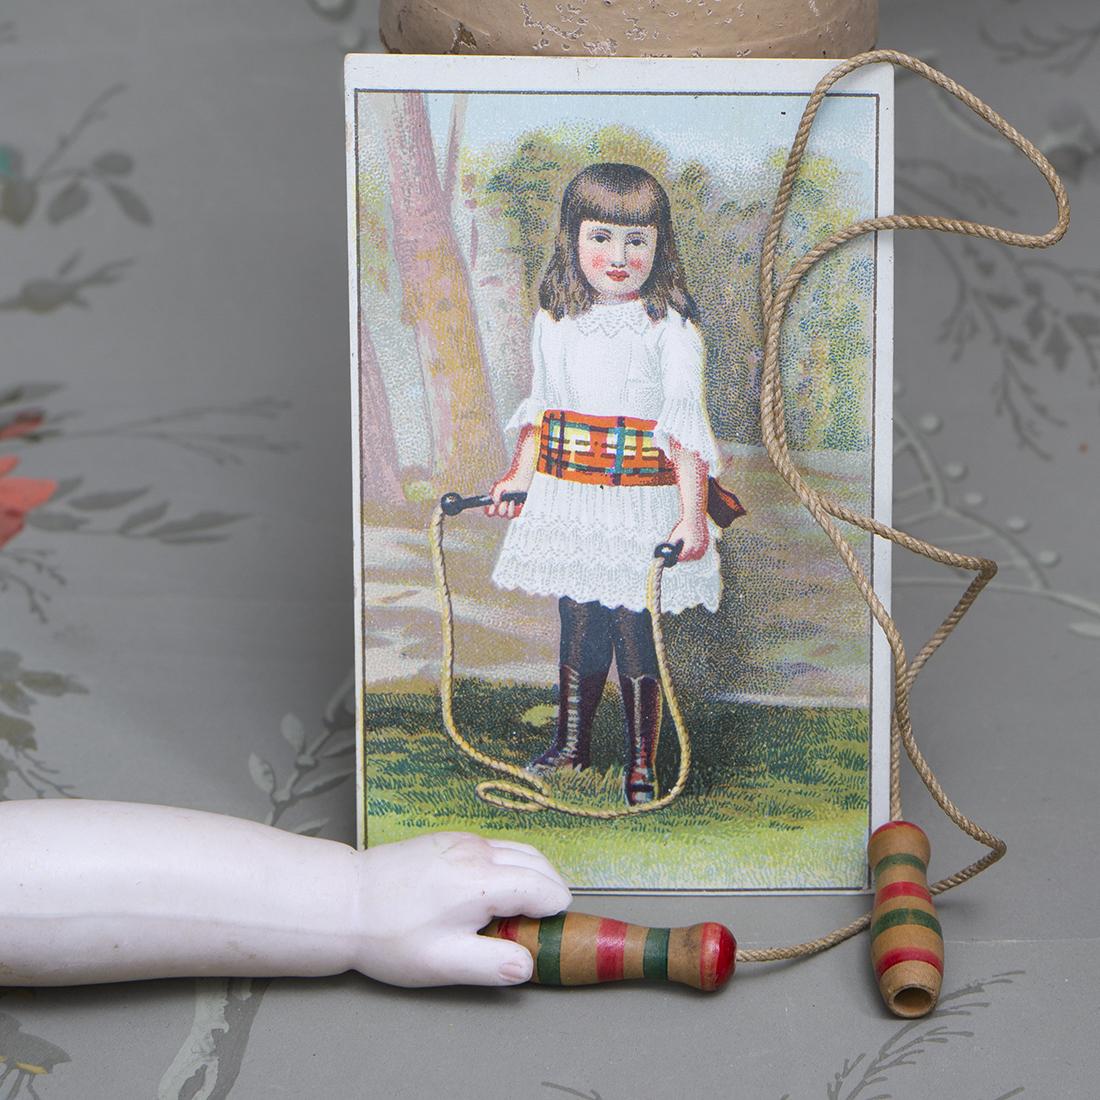 Doll skipping jump rope